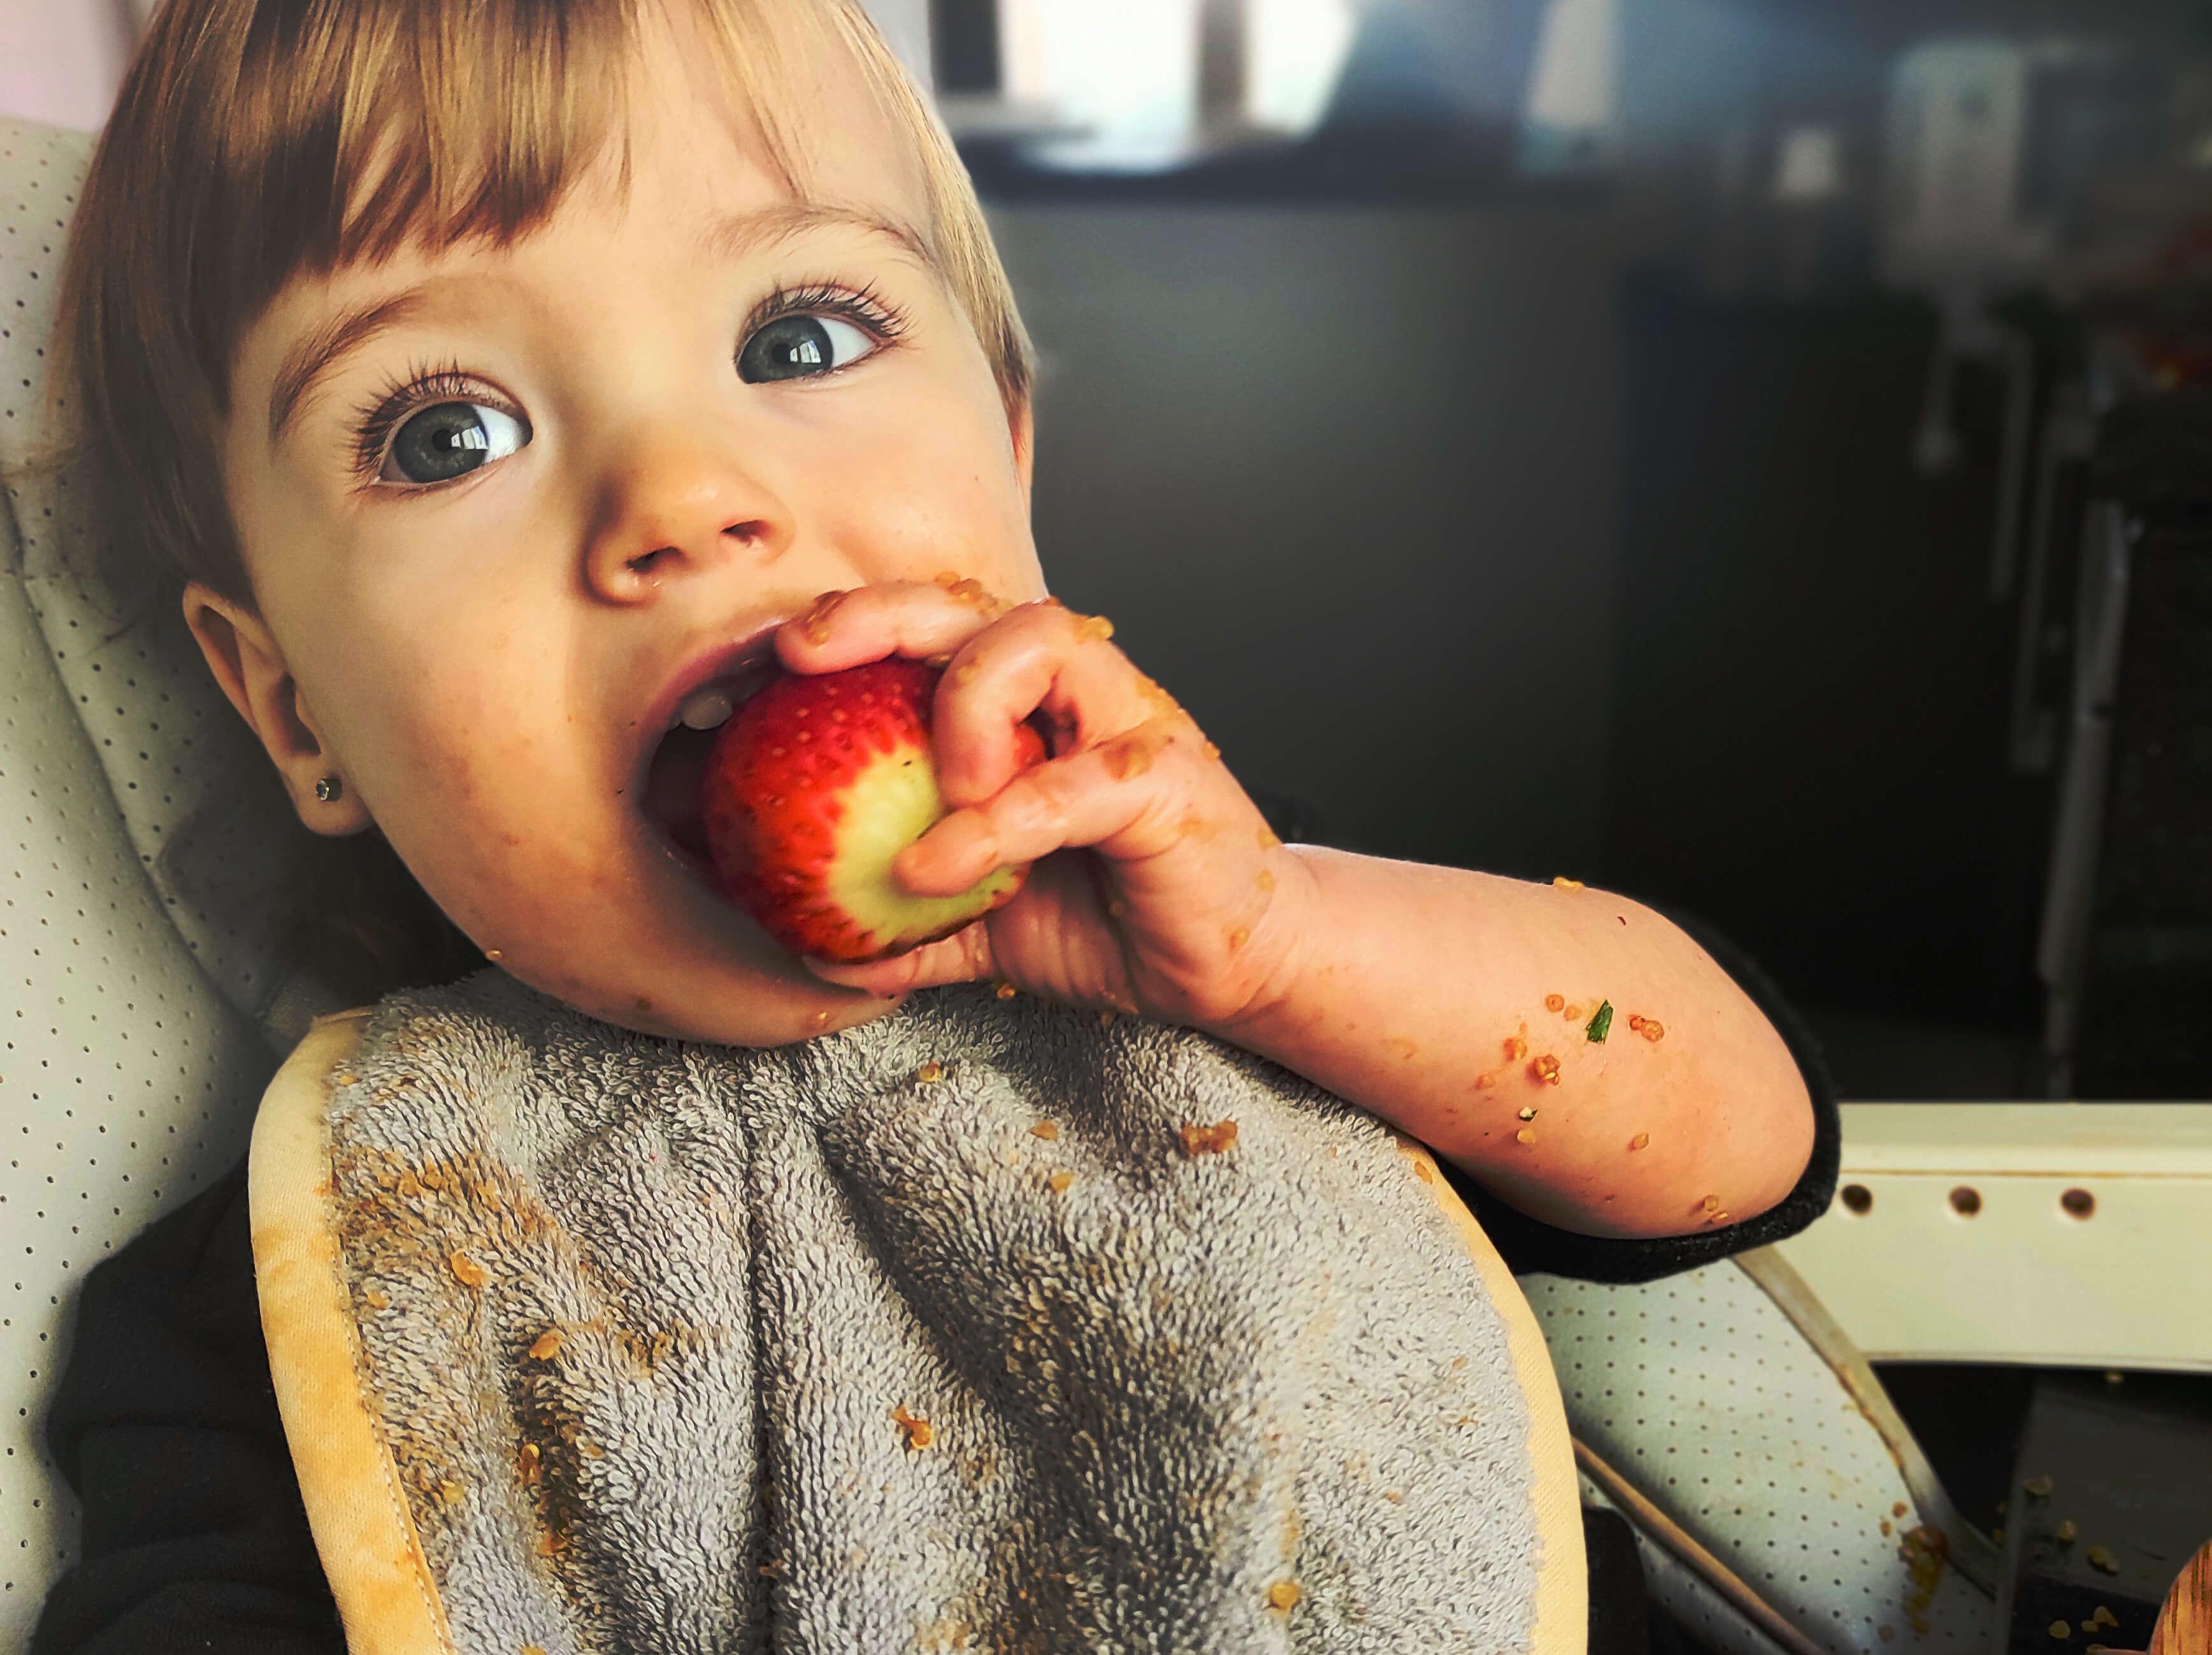 Nora comiendo una fresa